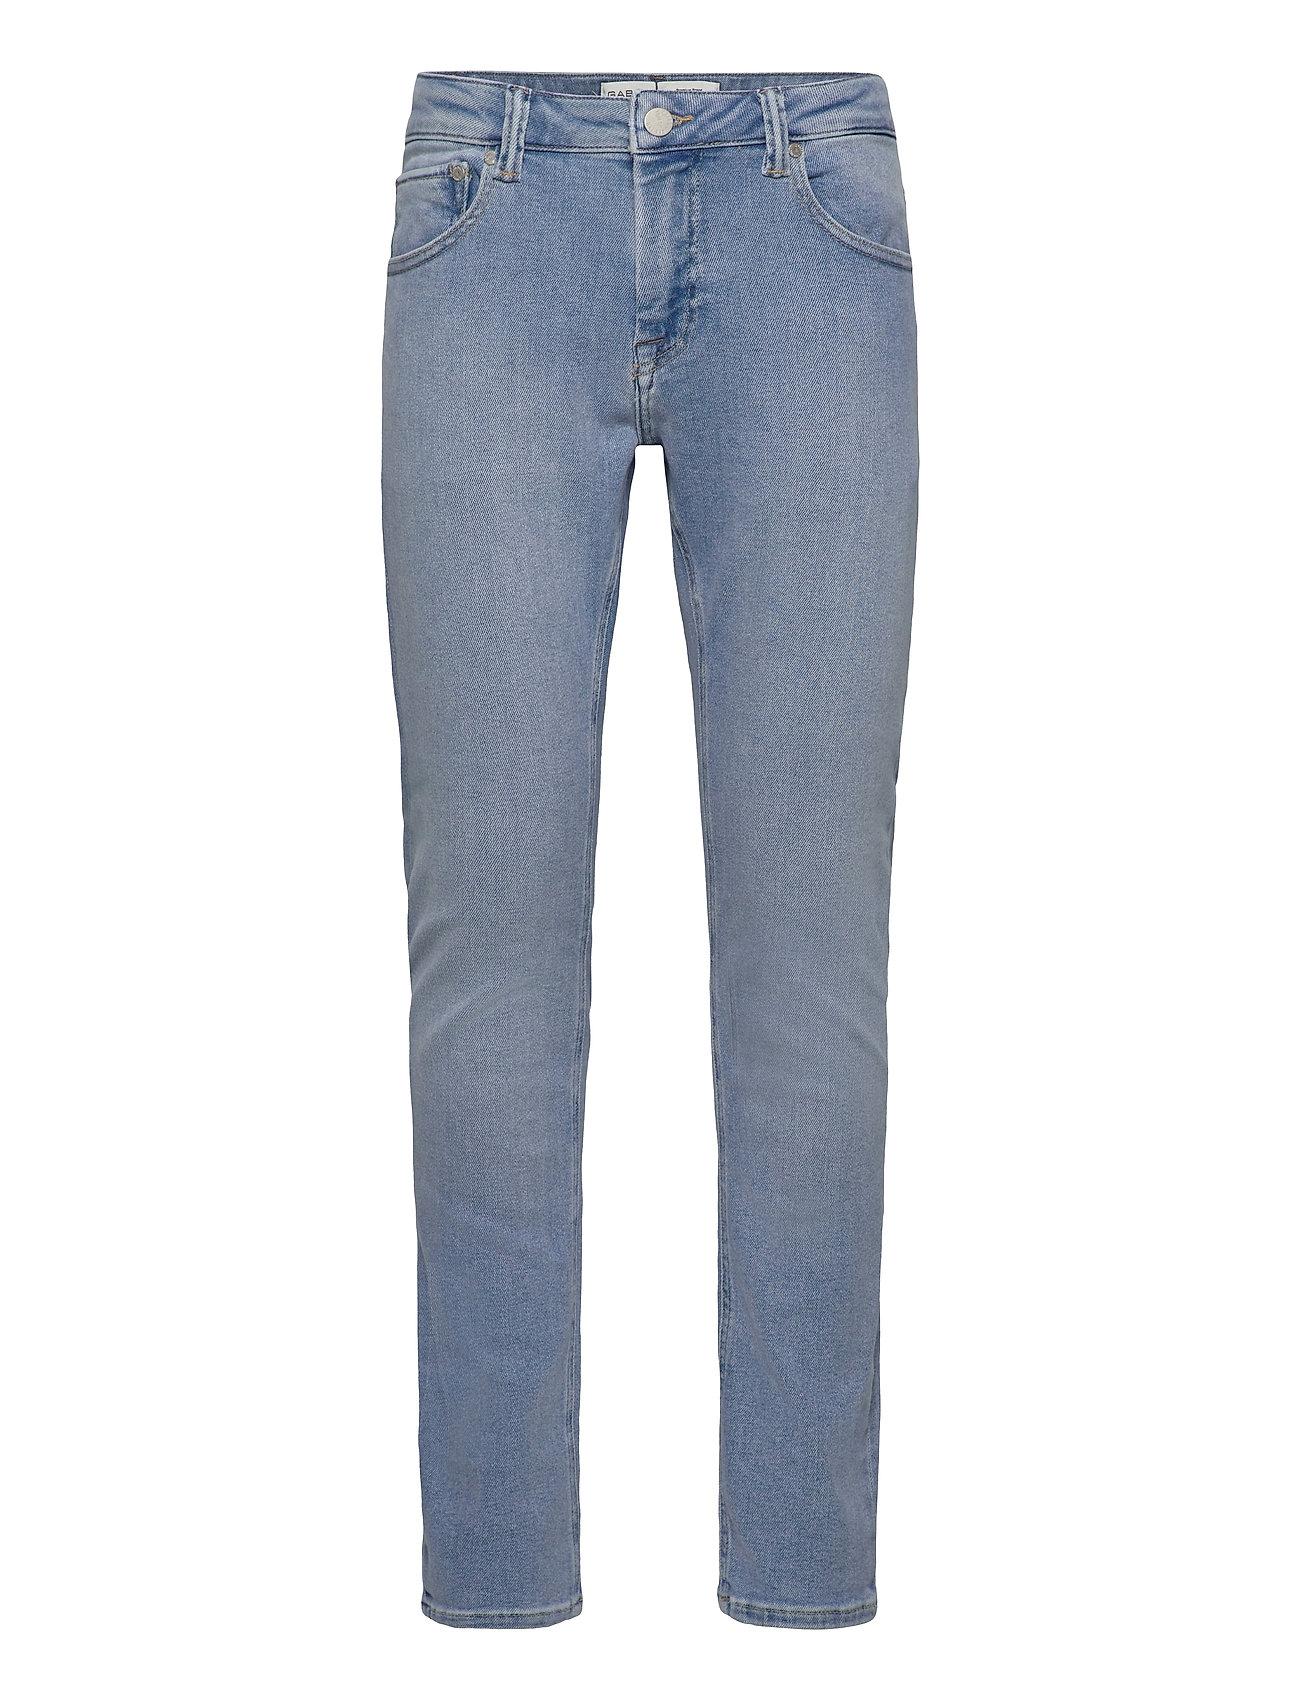 Image of J S K3826 Jeans Slim Jeans Blå Gabba (3484278355)